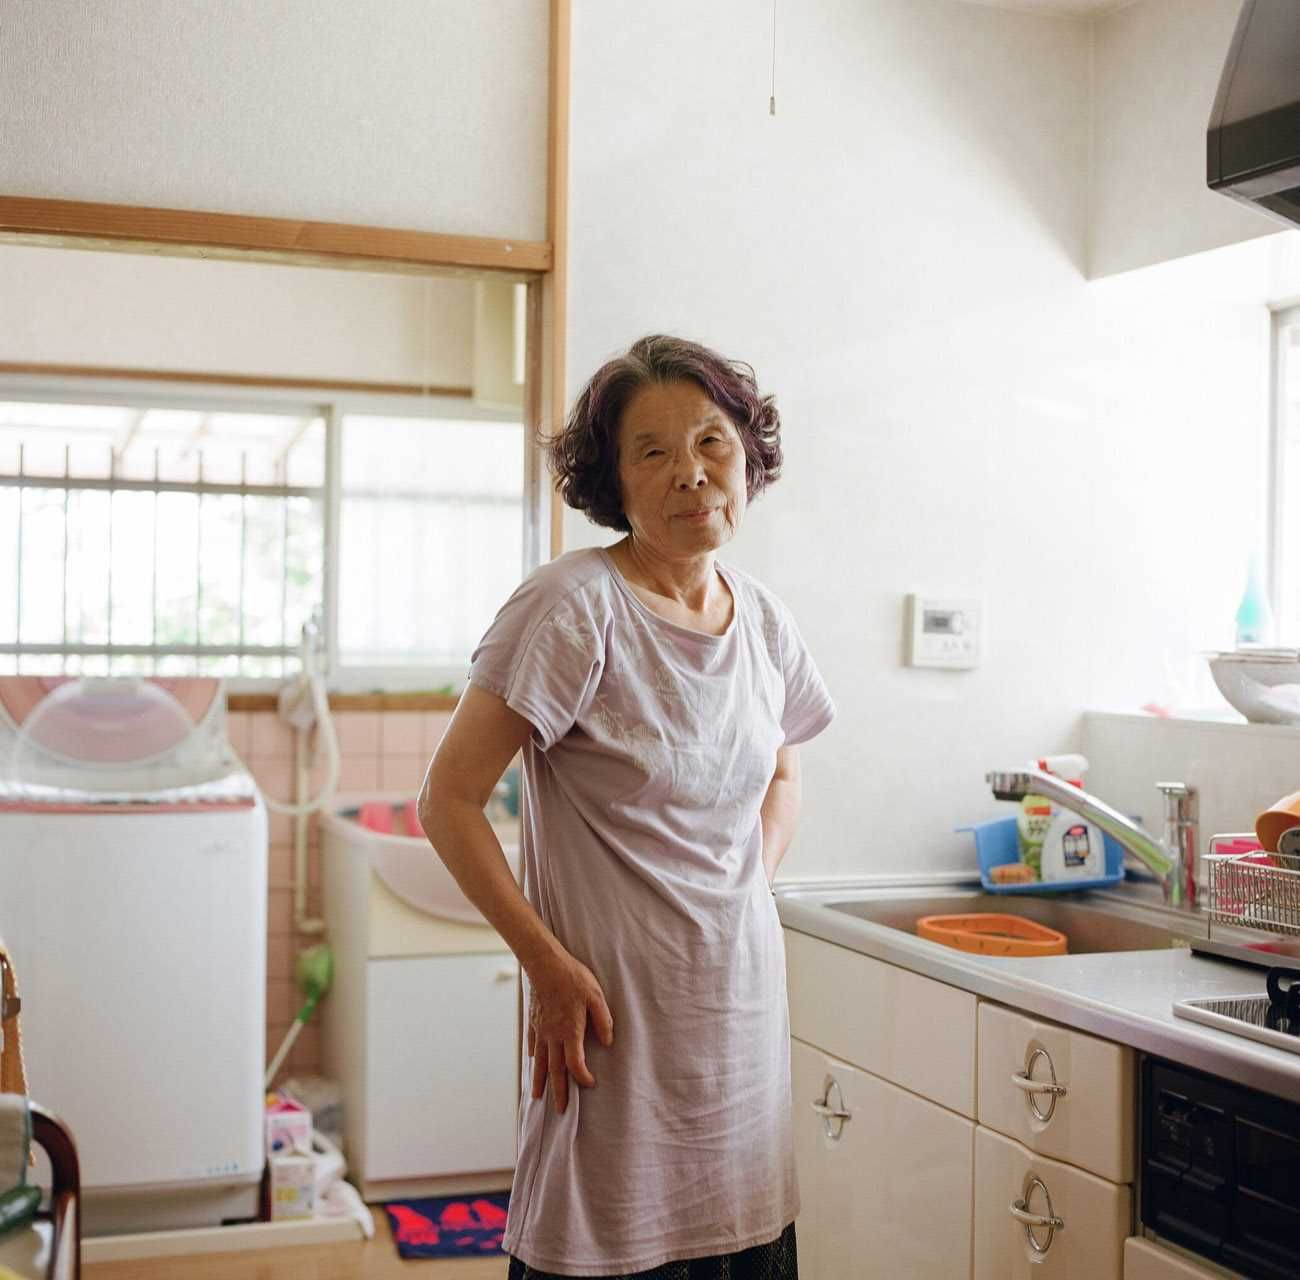 Mitsugetsu: The Beauty of Elderly Woman by Kenta Nakamura #inspiration #photography